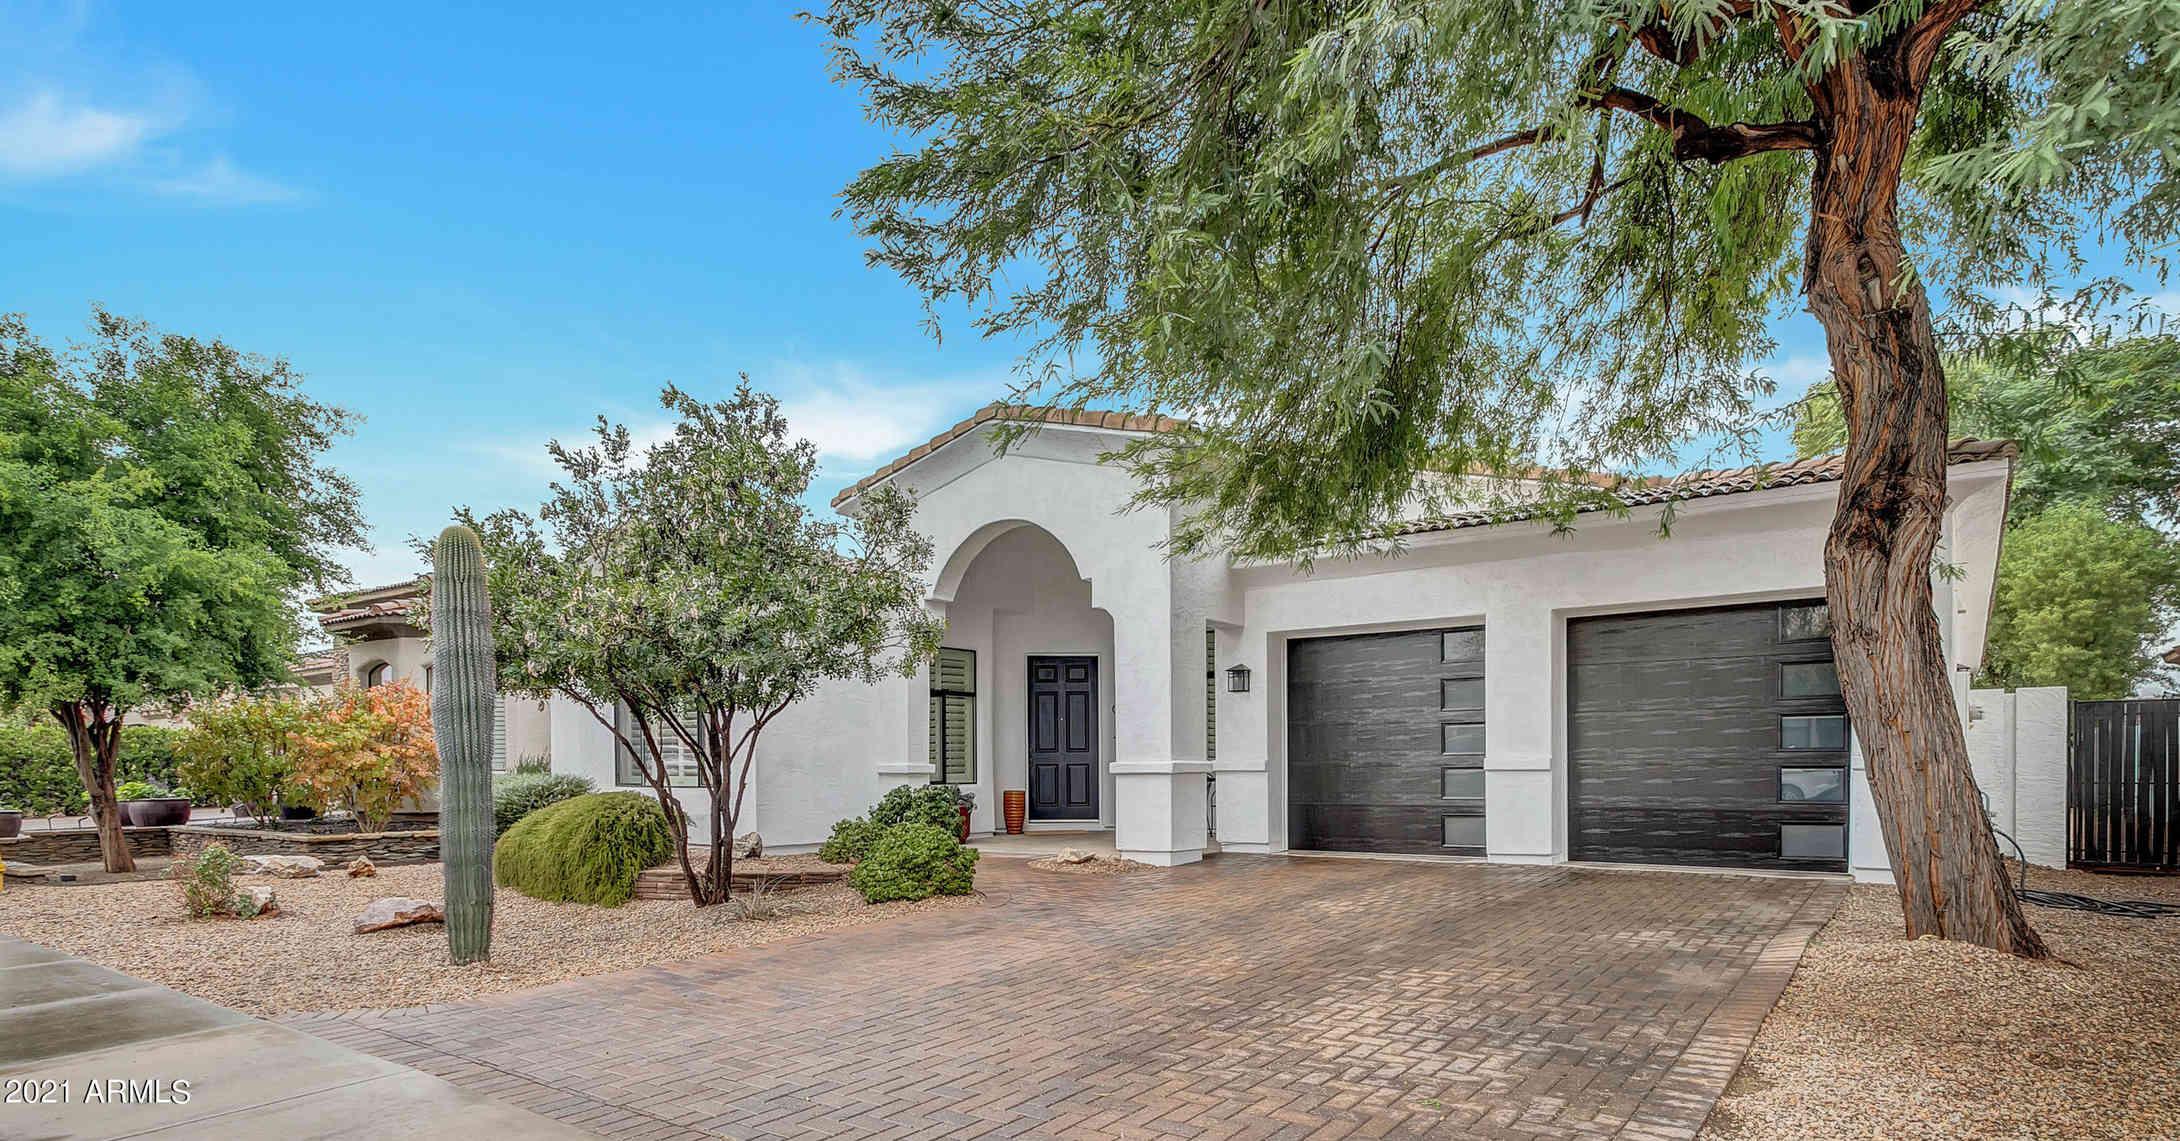 3014 N 50TH Street, Phoenix, AZ, 85018,